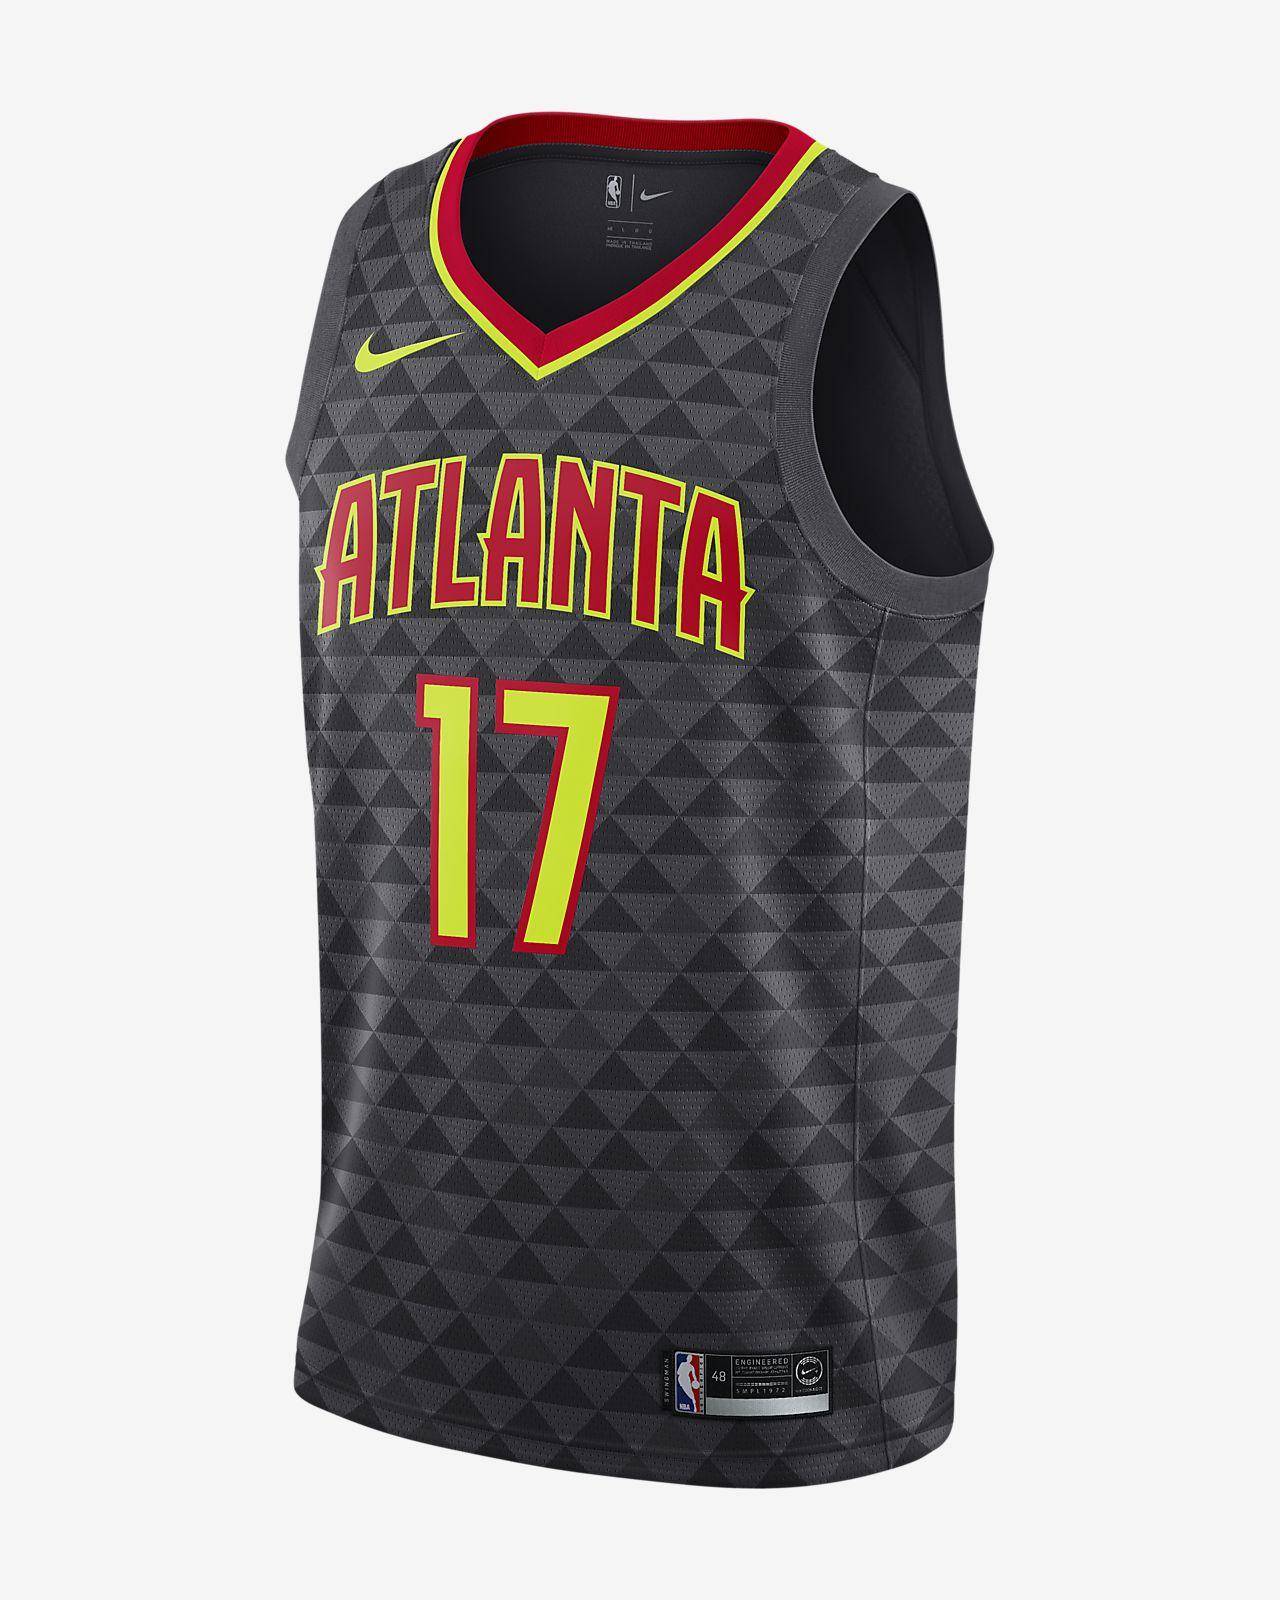 Maillot connecté Nike NBA Dennis Schröder Icon Edition Swingman (Atlanta Hawks) pour Homme